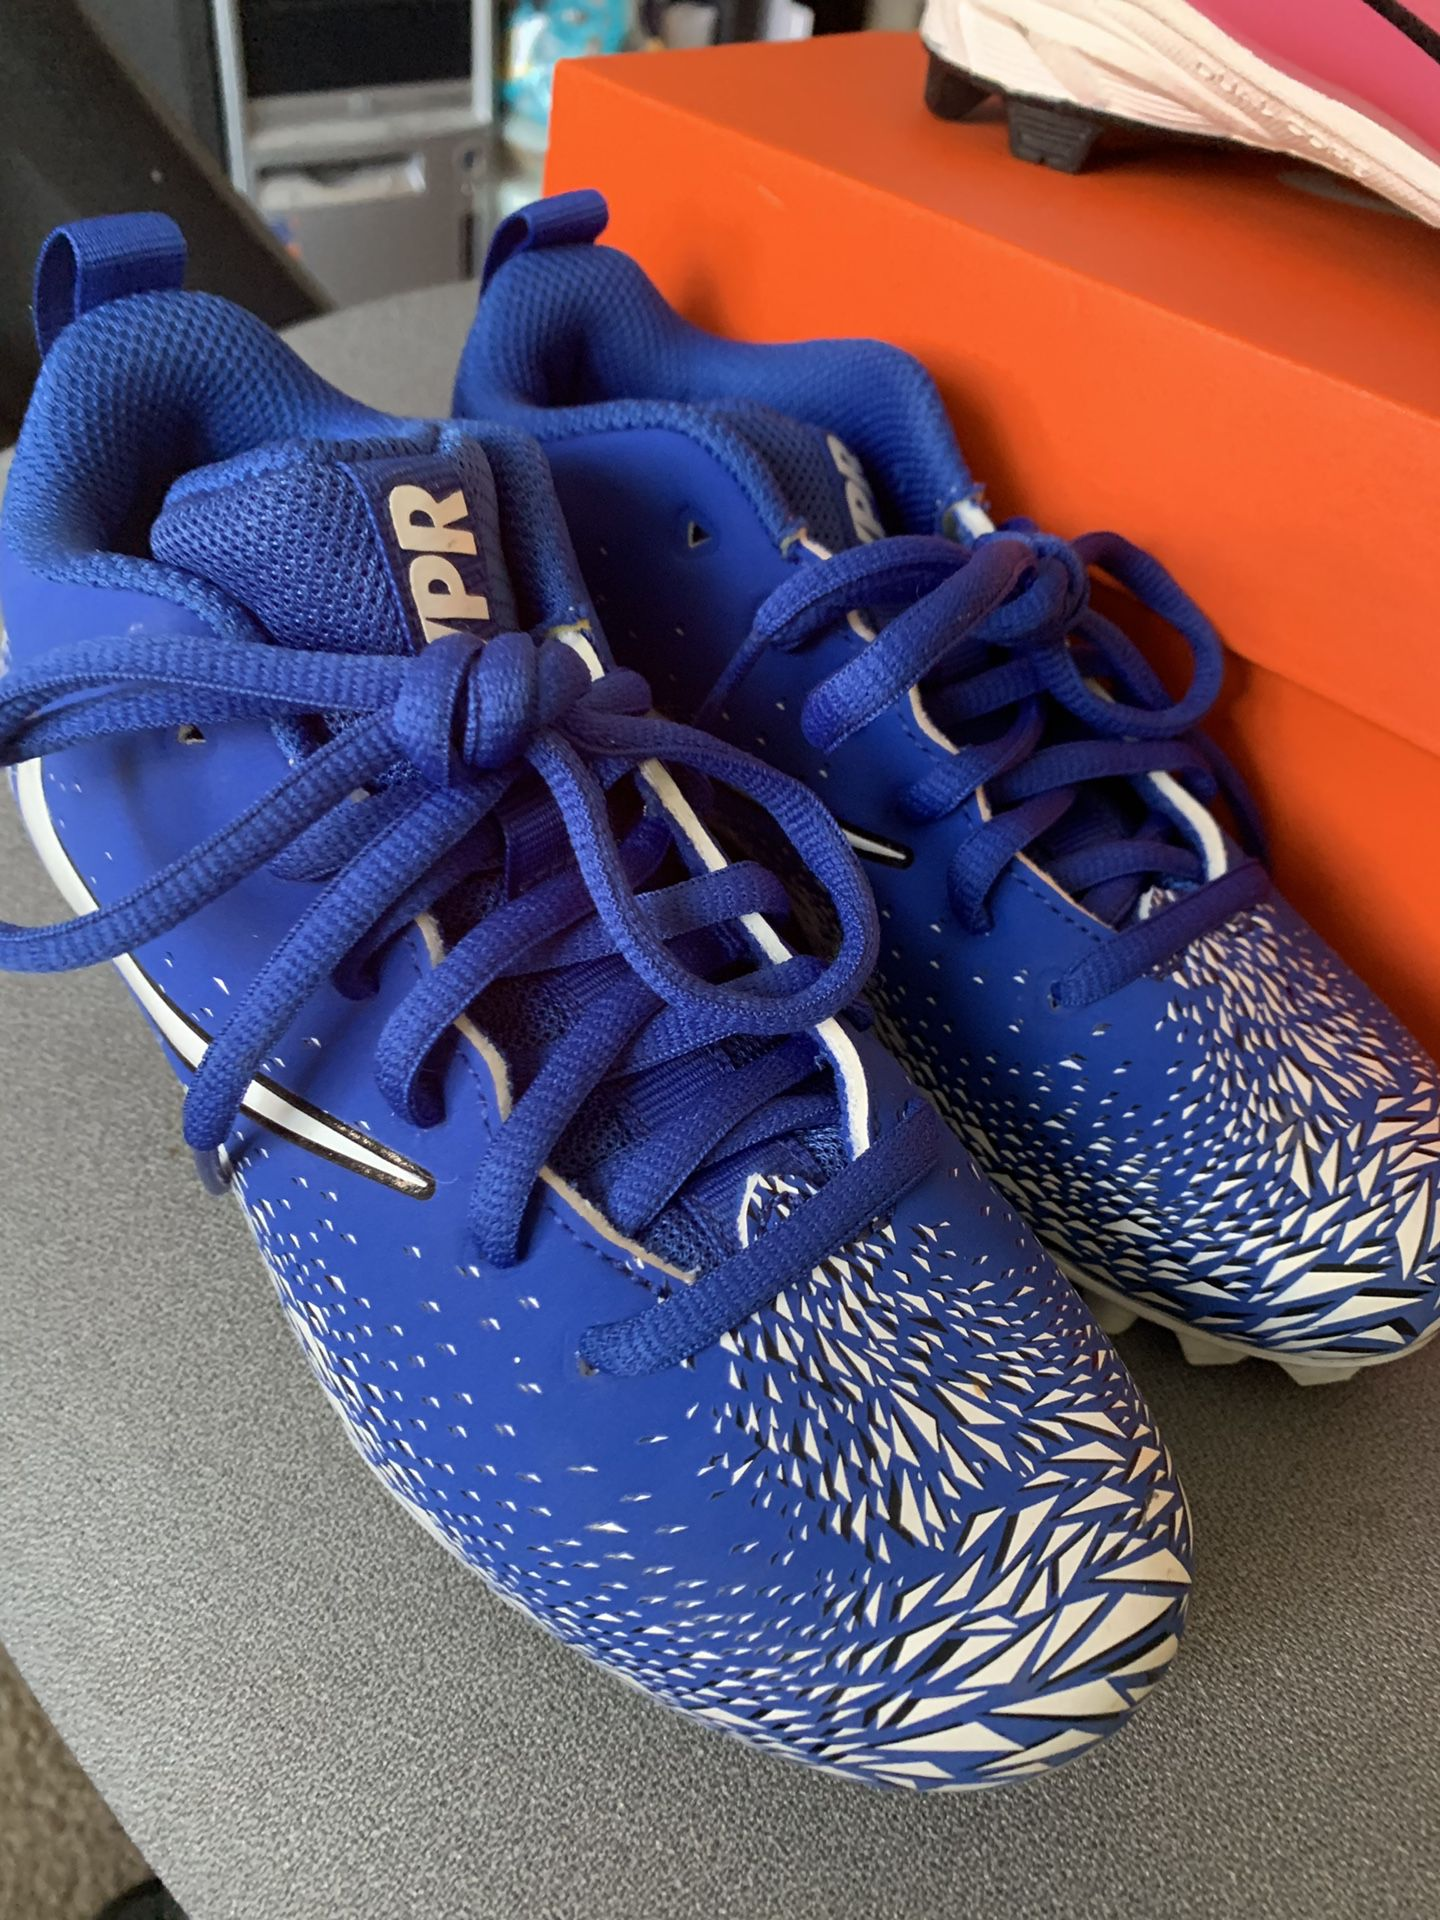 Nike/Rawlings Youth Football/Baseball Cleats